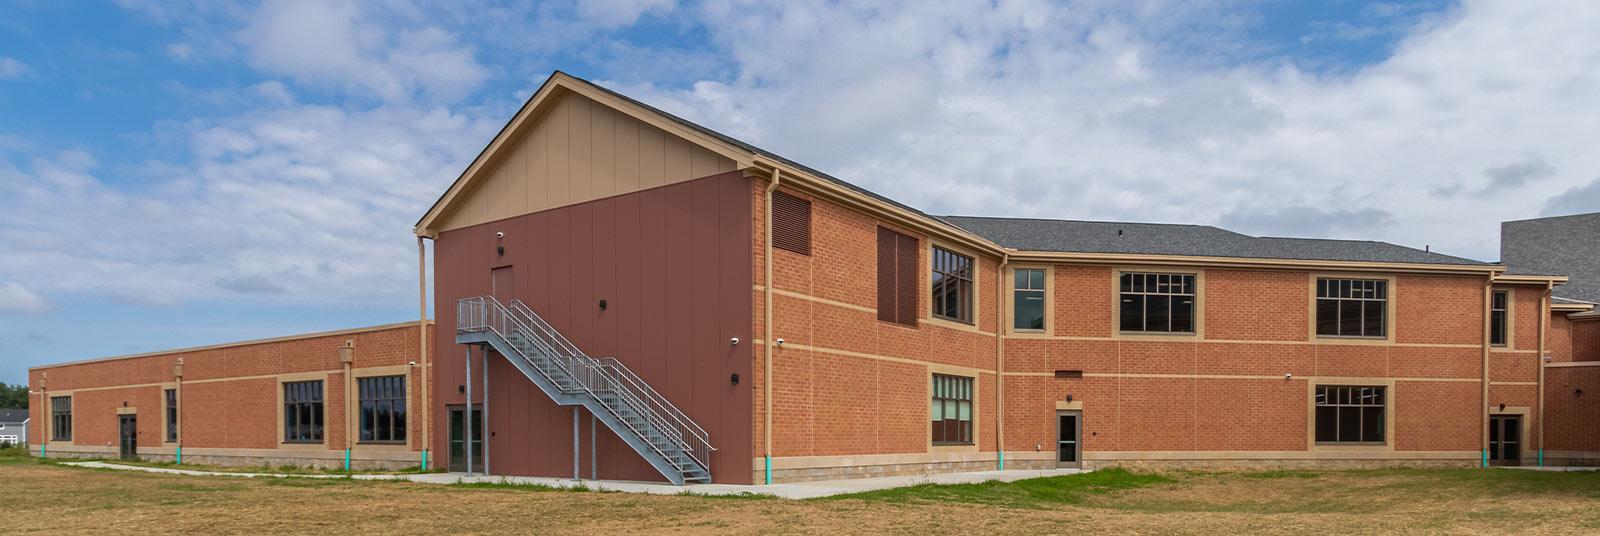 Back of the addition to Little Miami Intermediate School in Maineville, Ohio